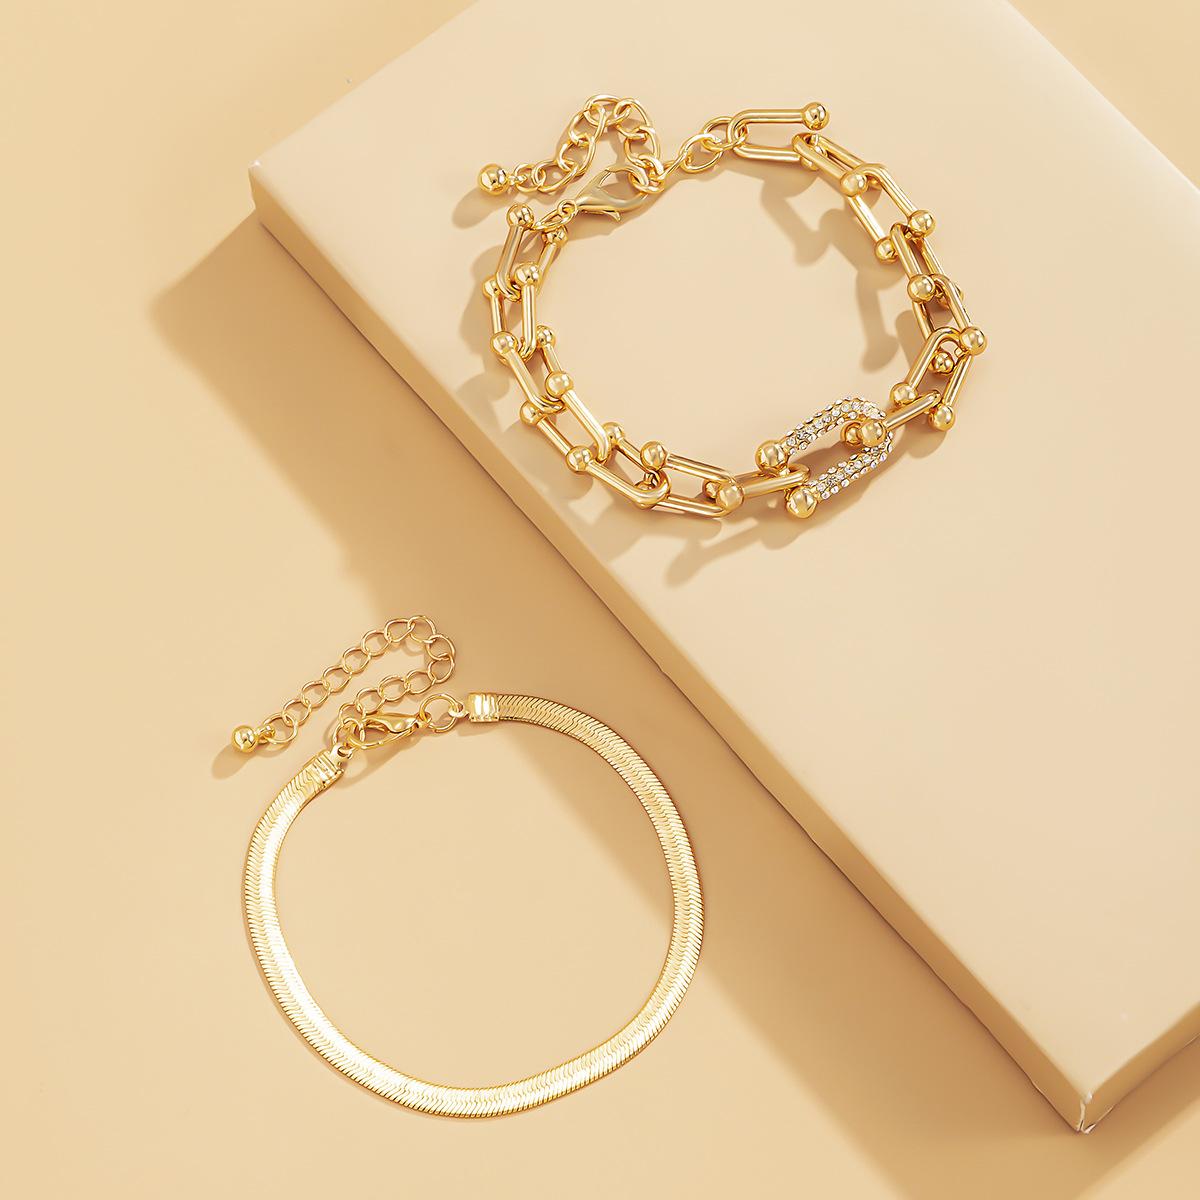 LW Street Square Buckle Gold Bracelet